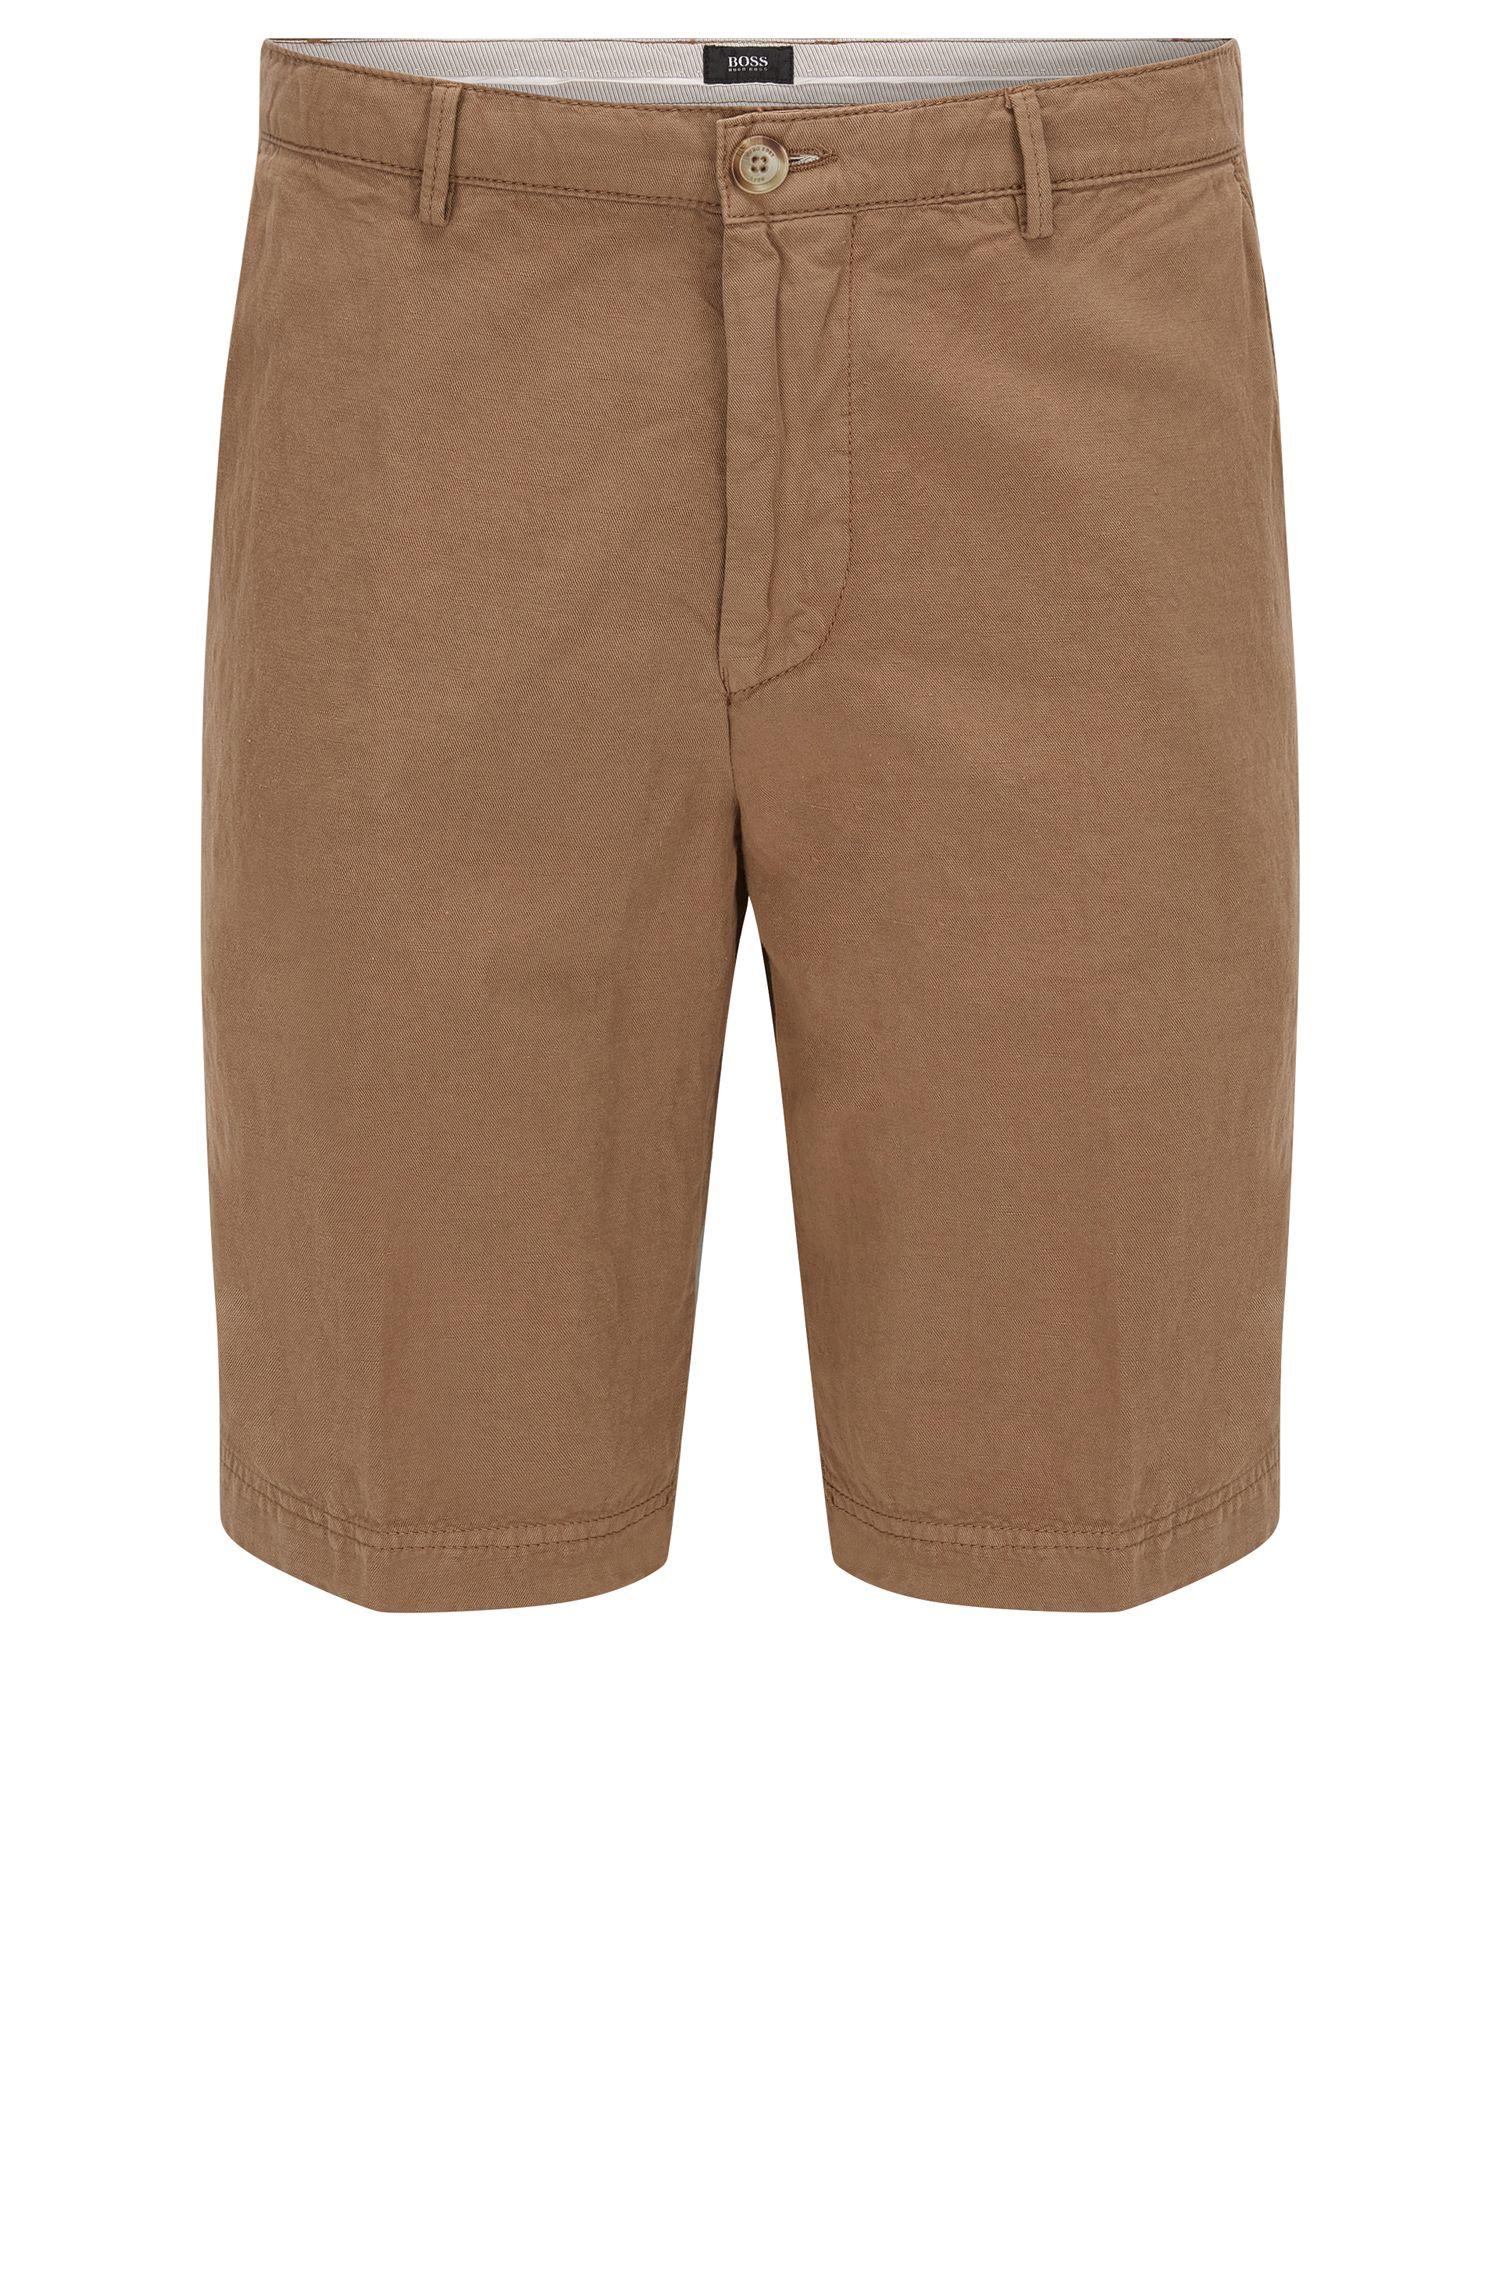 'Crigan Short D' | Regular Fit, Cotton Linen Shorts